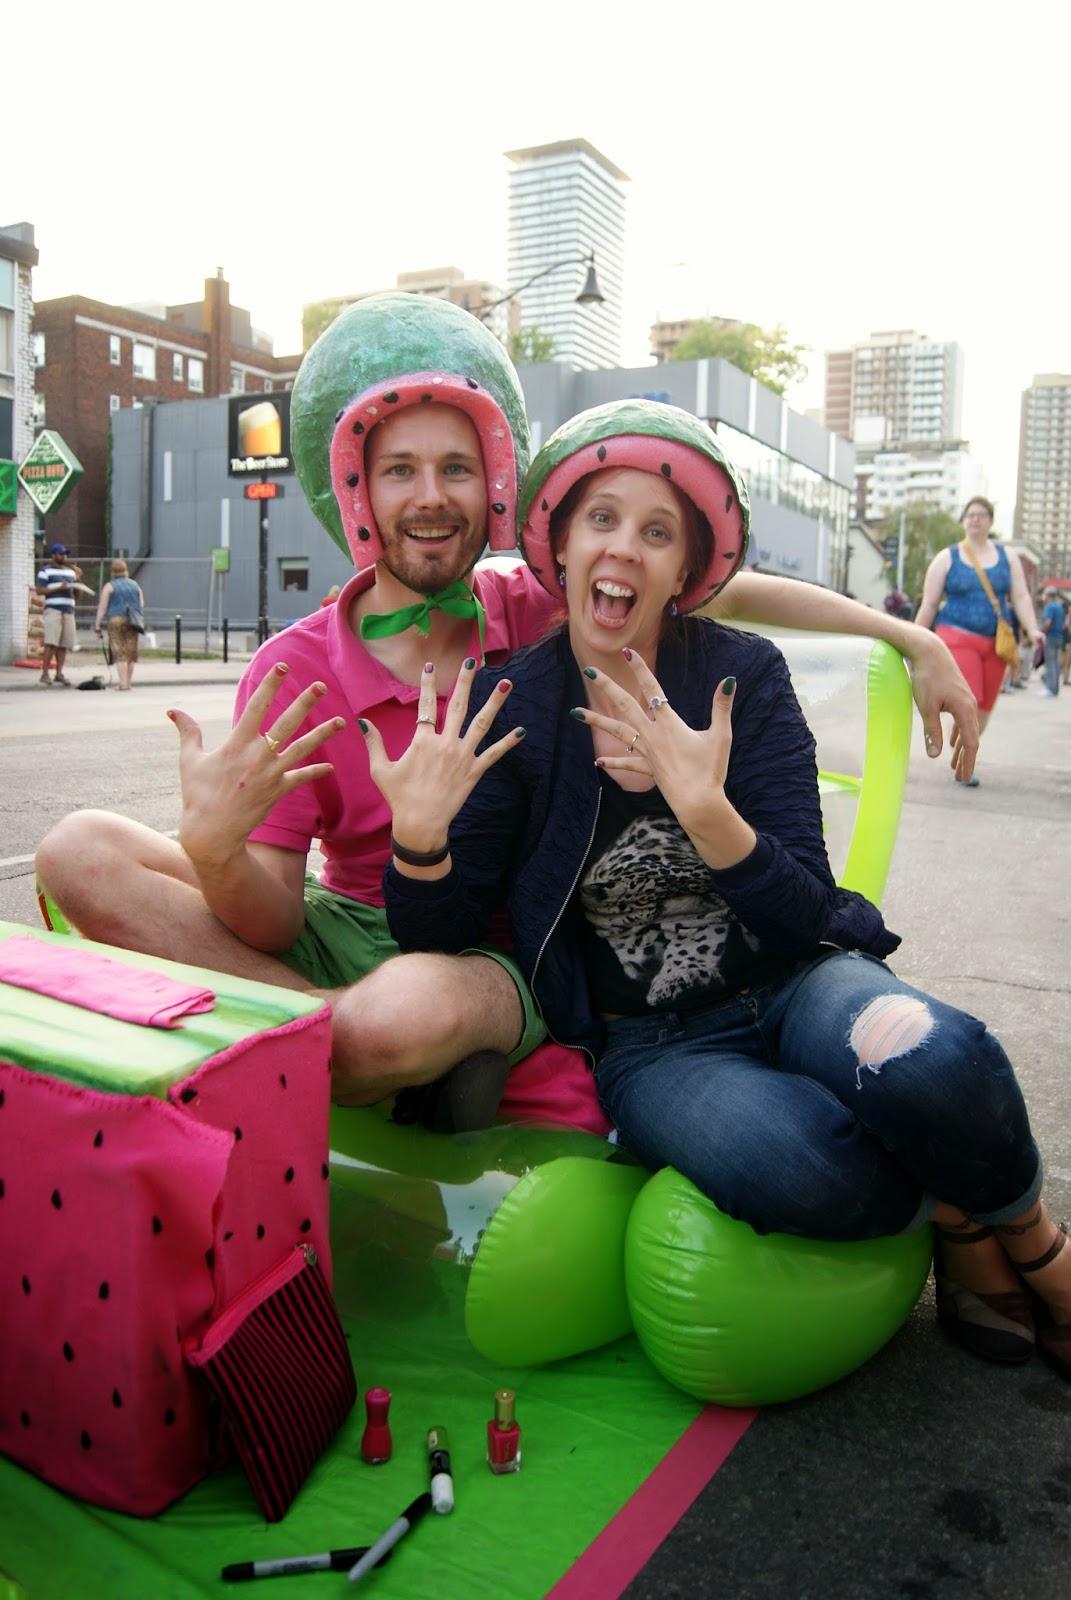 Nuit Rose Art Event, Expert Nailz, Humboldt Magnussen, World Pride, Toronto, Melanie_Ps, The Purple Scarf, Ontario, Canada, culture, art, event,lifestyle, gay, lesbian, lightoxes, artmatters, LGBT, manicure, watermelon, nails,nailpolish, performance